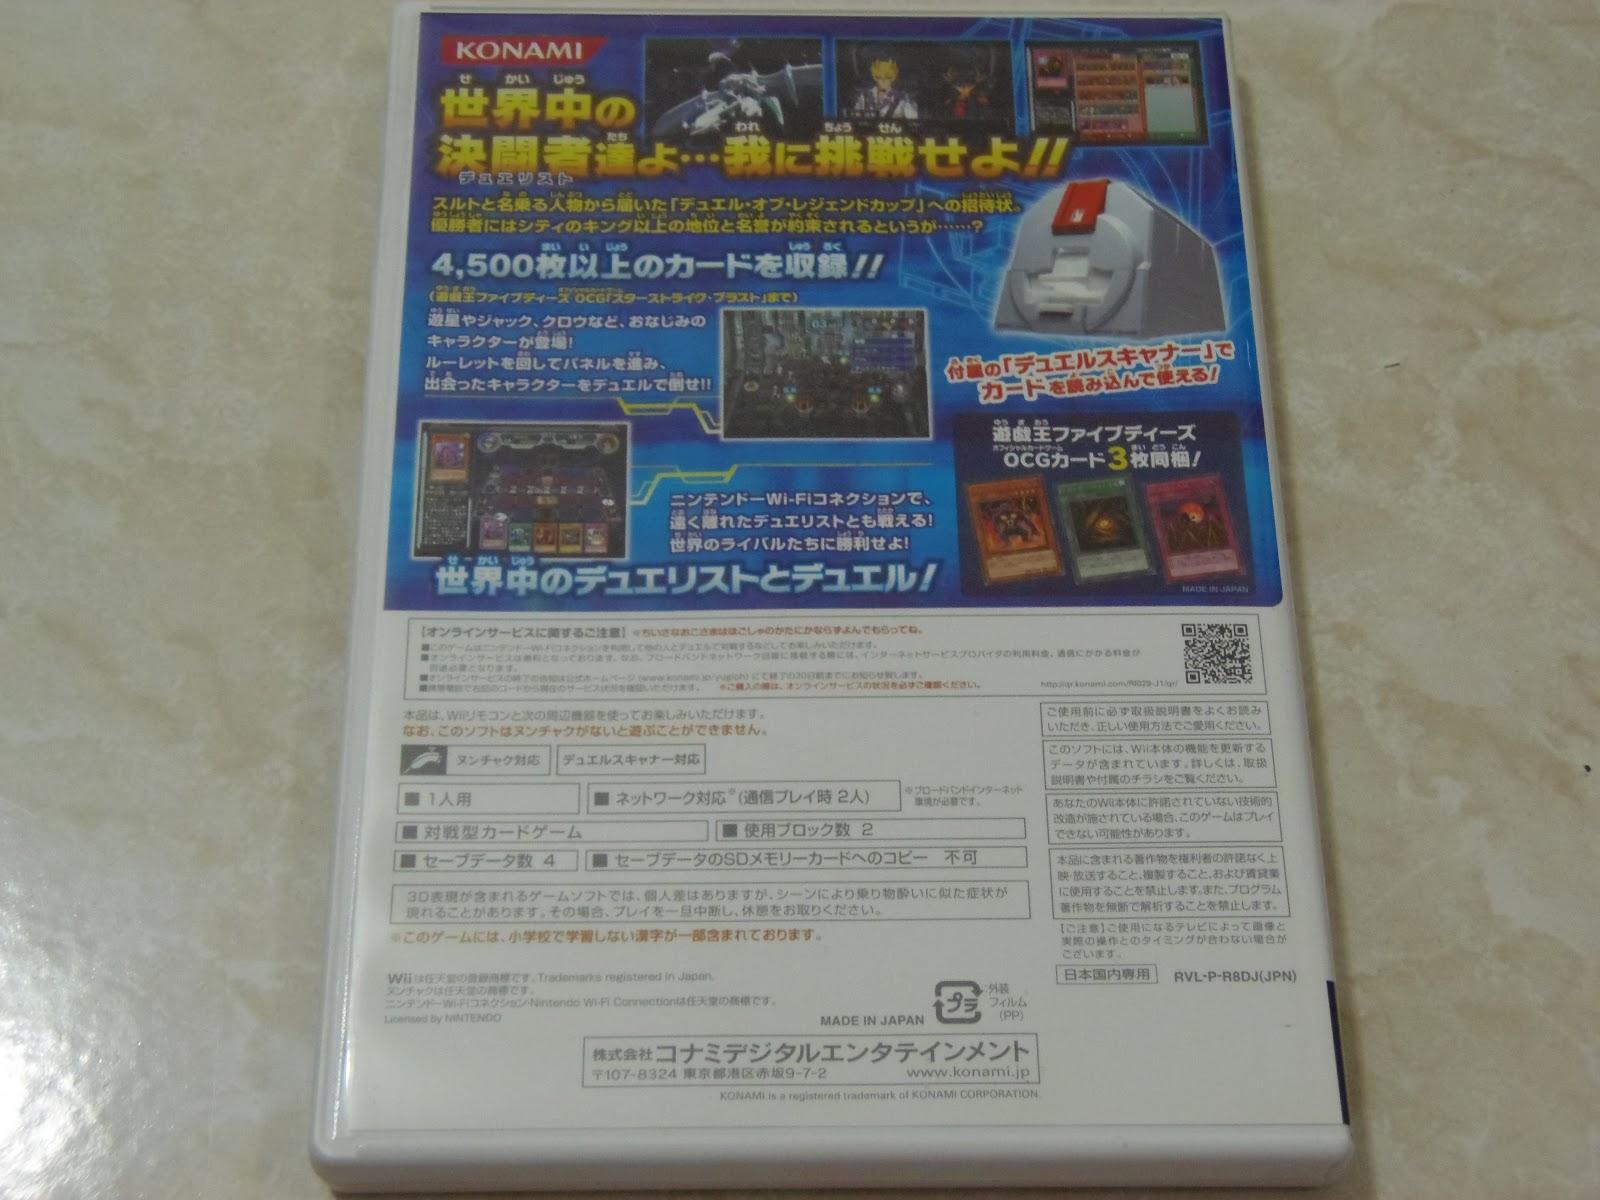 RS萬事屋: [遊戲分享] 遊戲王 5D's Duel Transer 入手簡易開箱